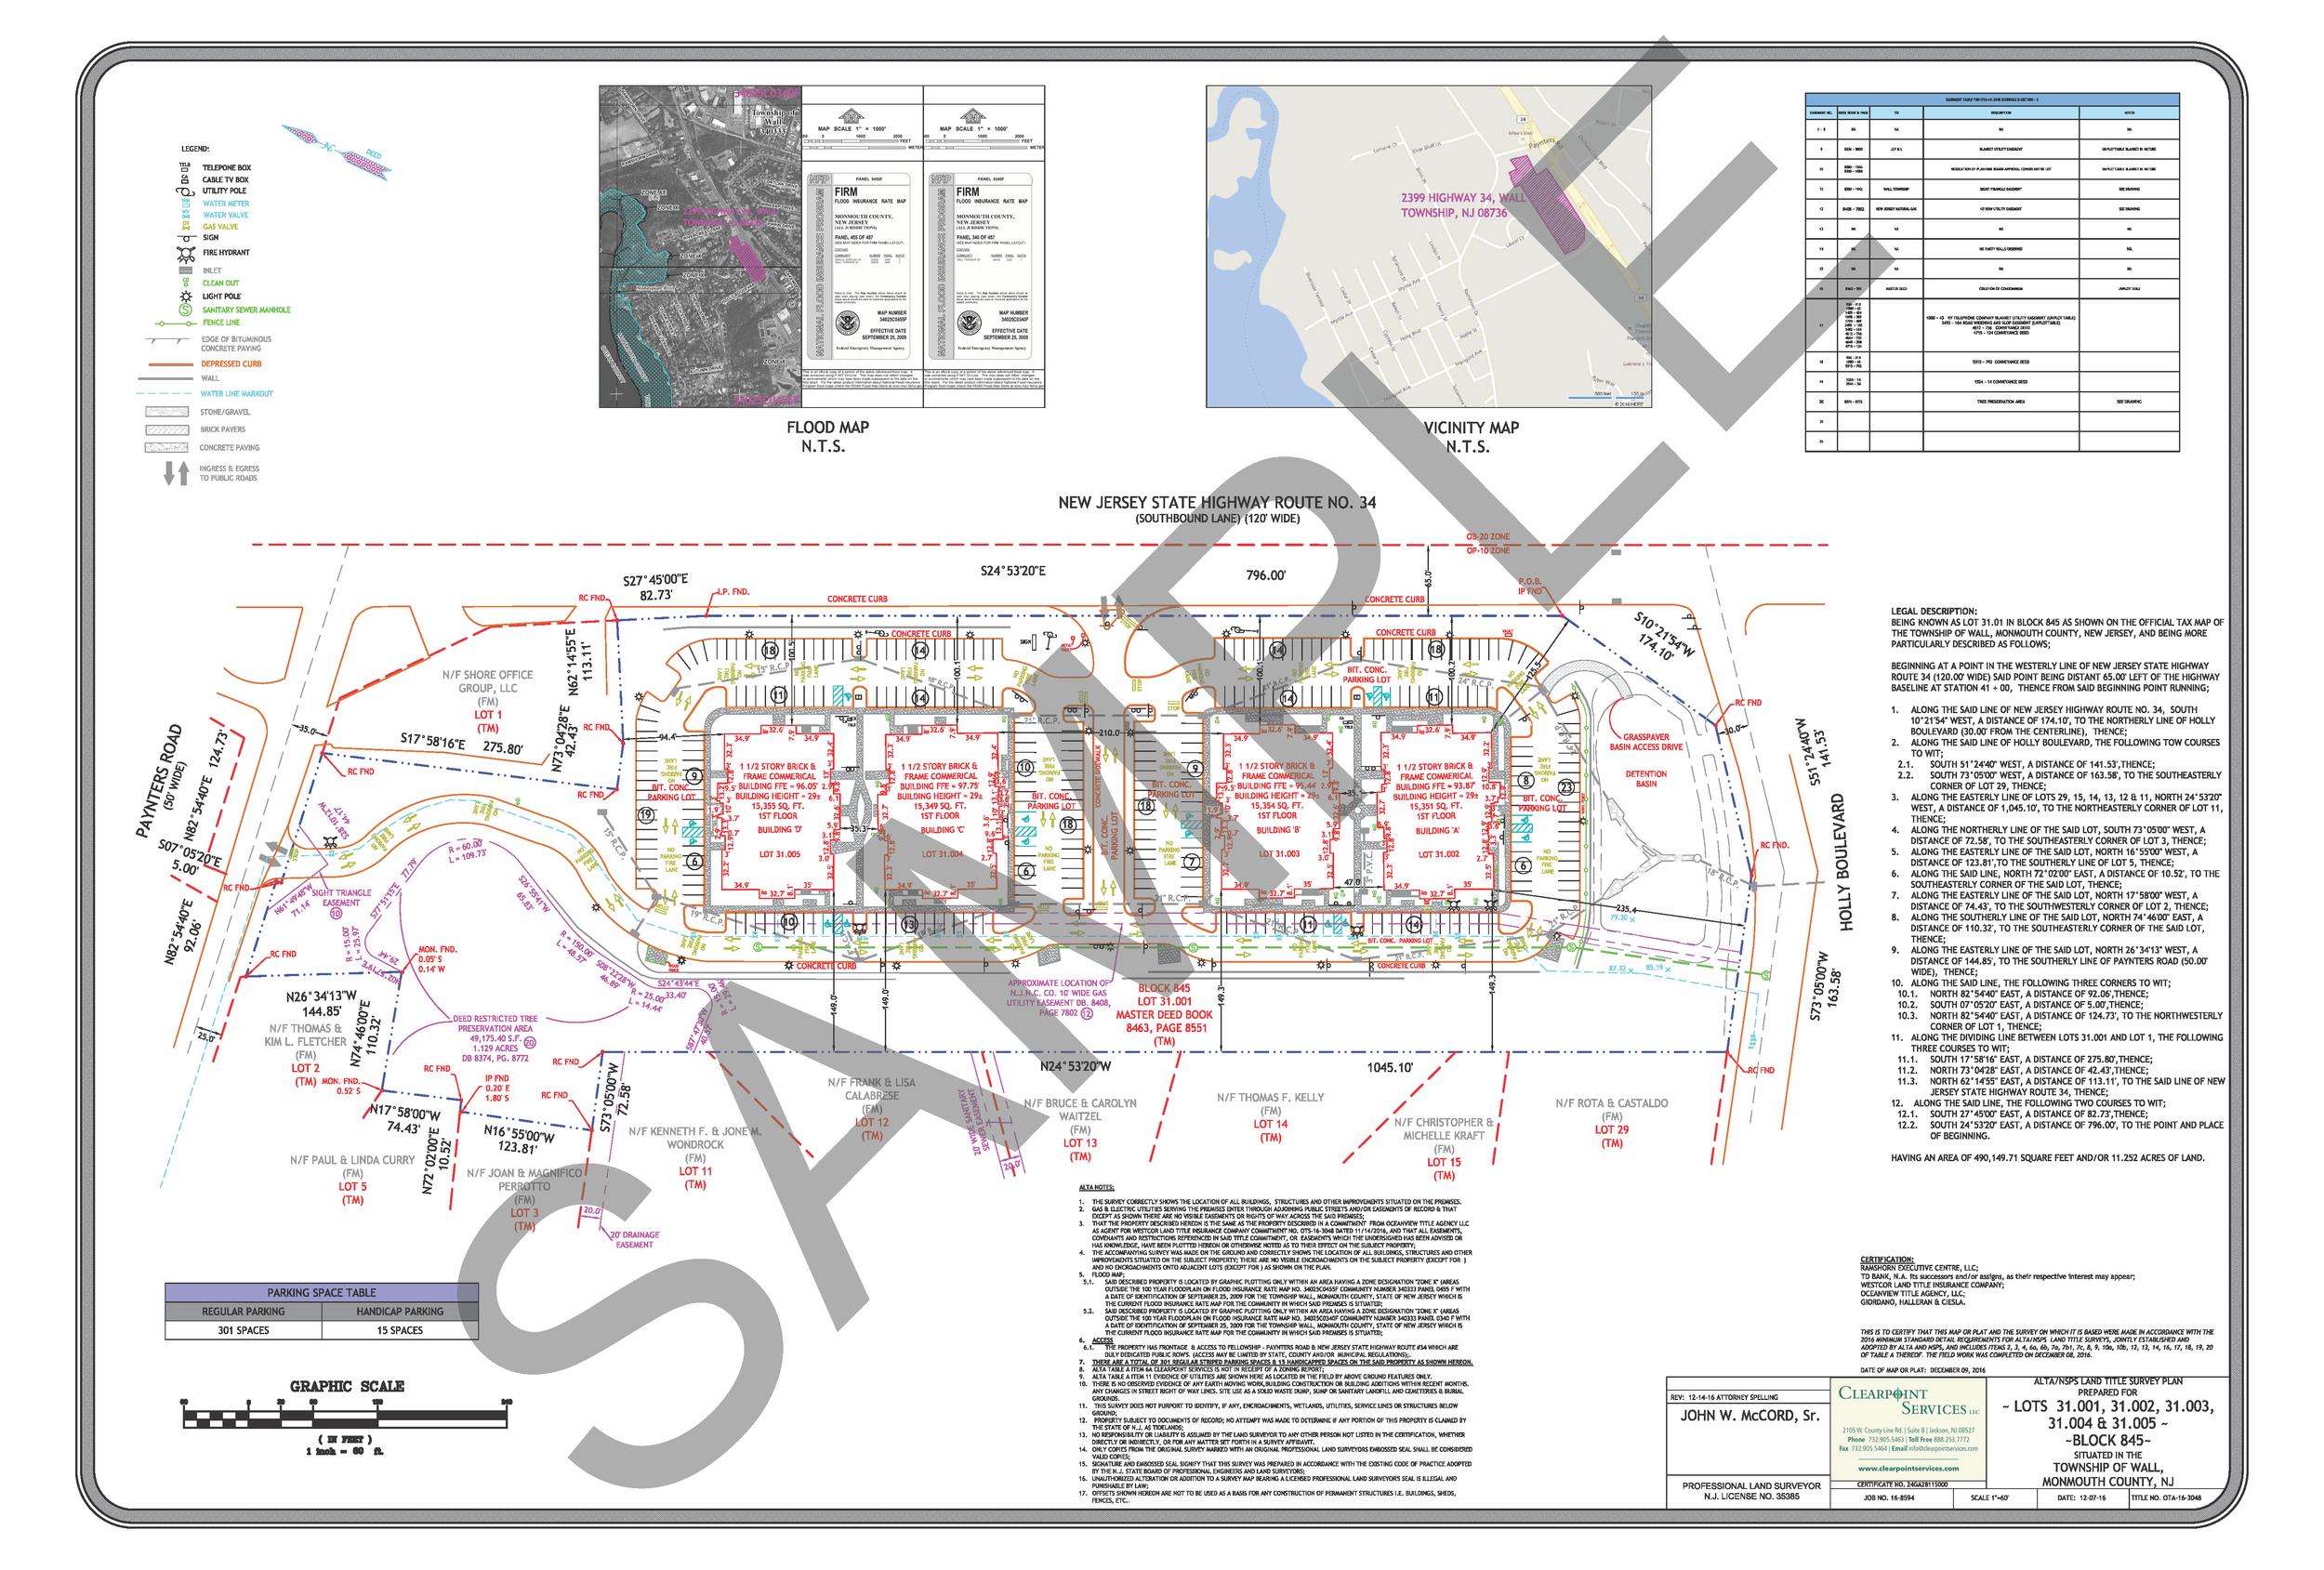 16-8594 ALTA.pdf - Adobe Acrobat Pro.png